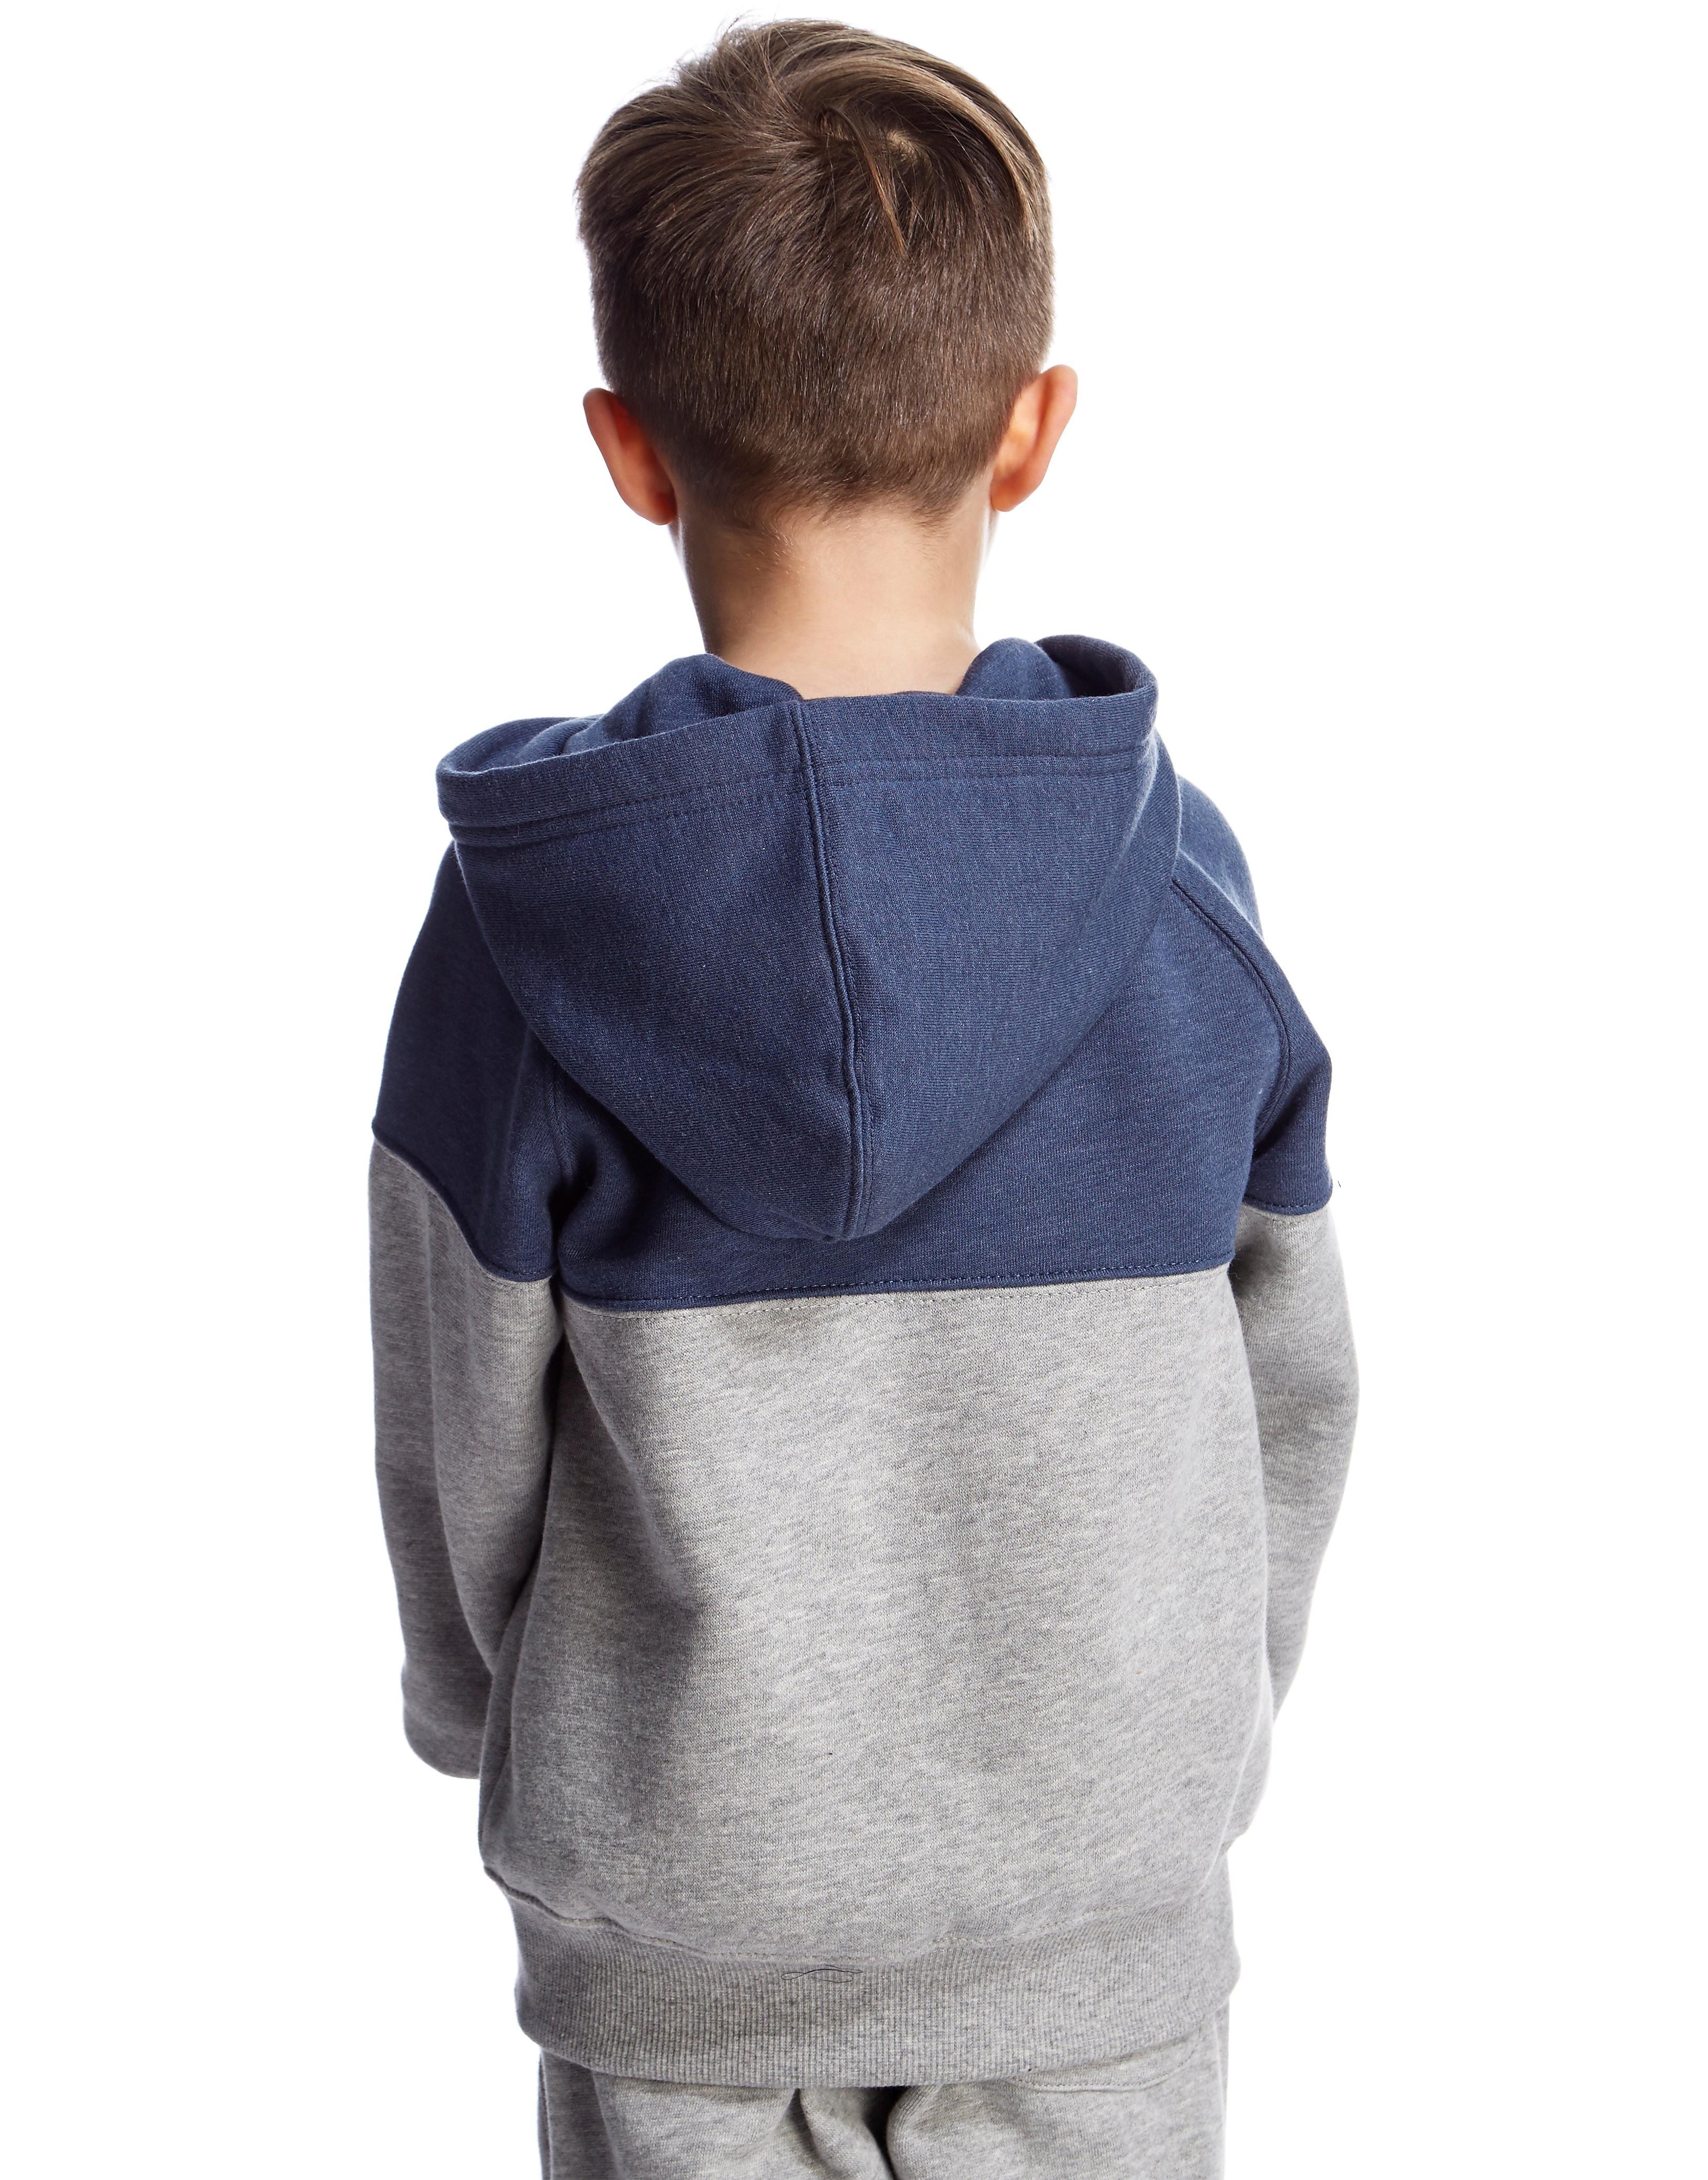 Converse Colour Block Full Zip Hoody Children